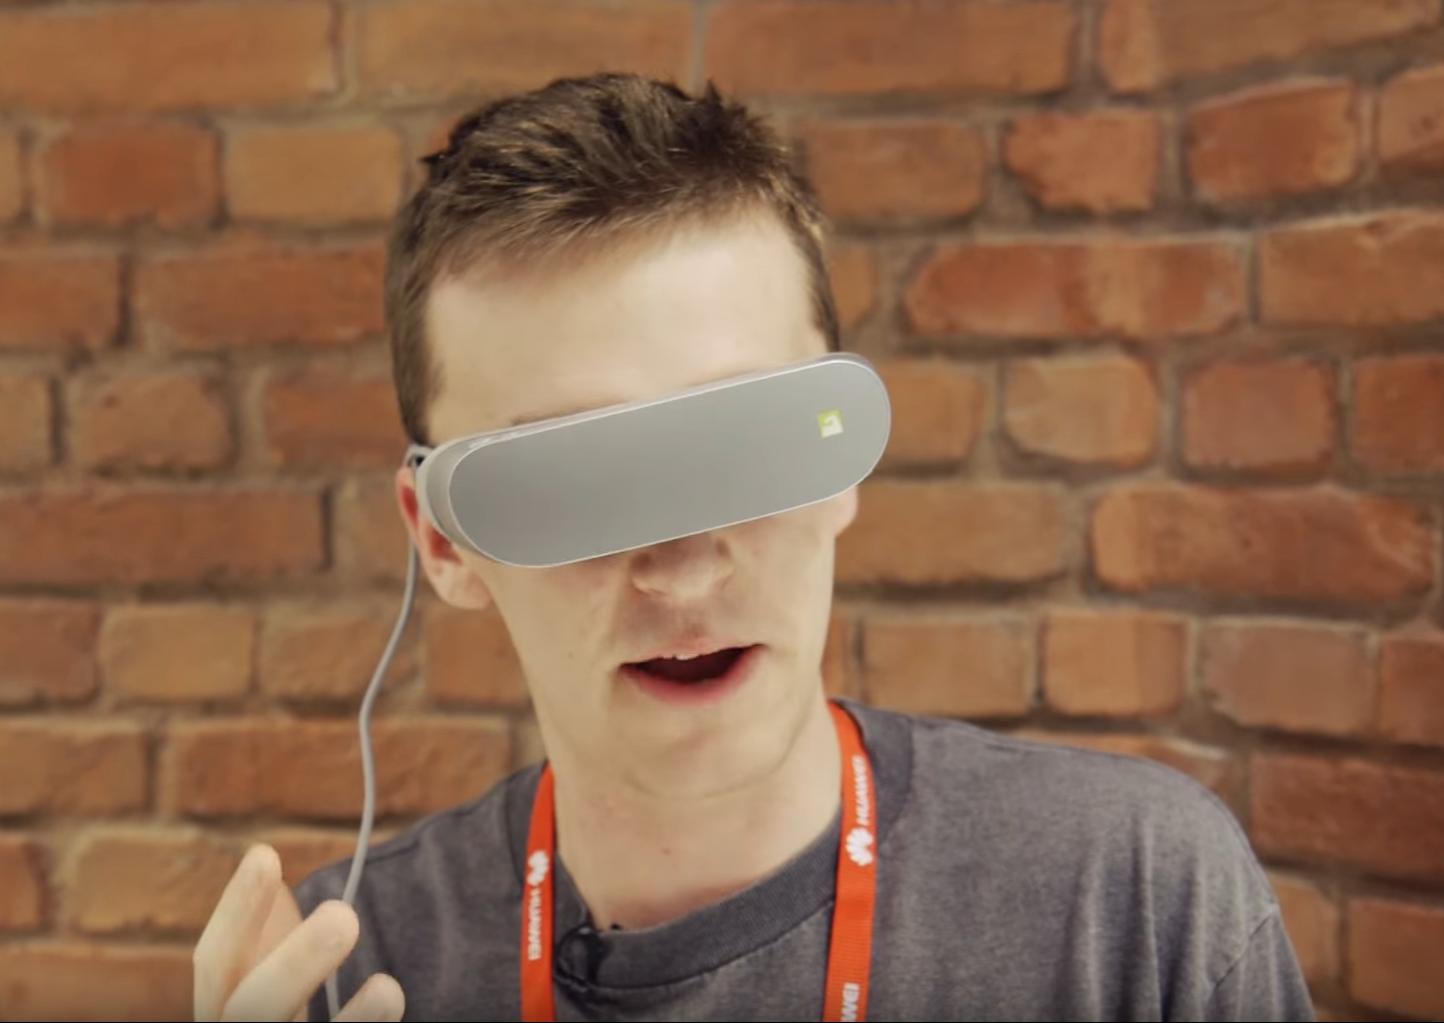 LG VR